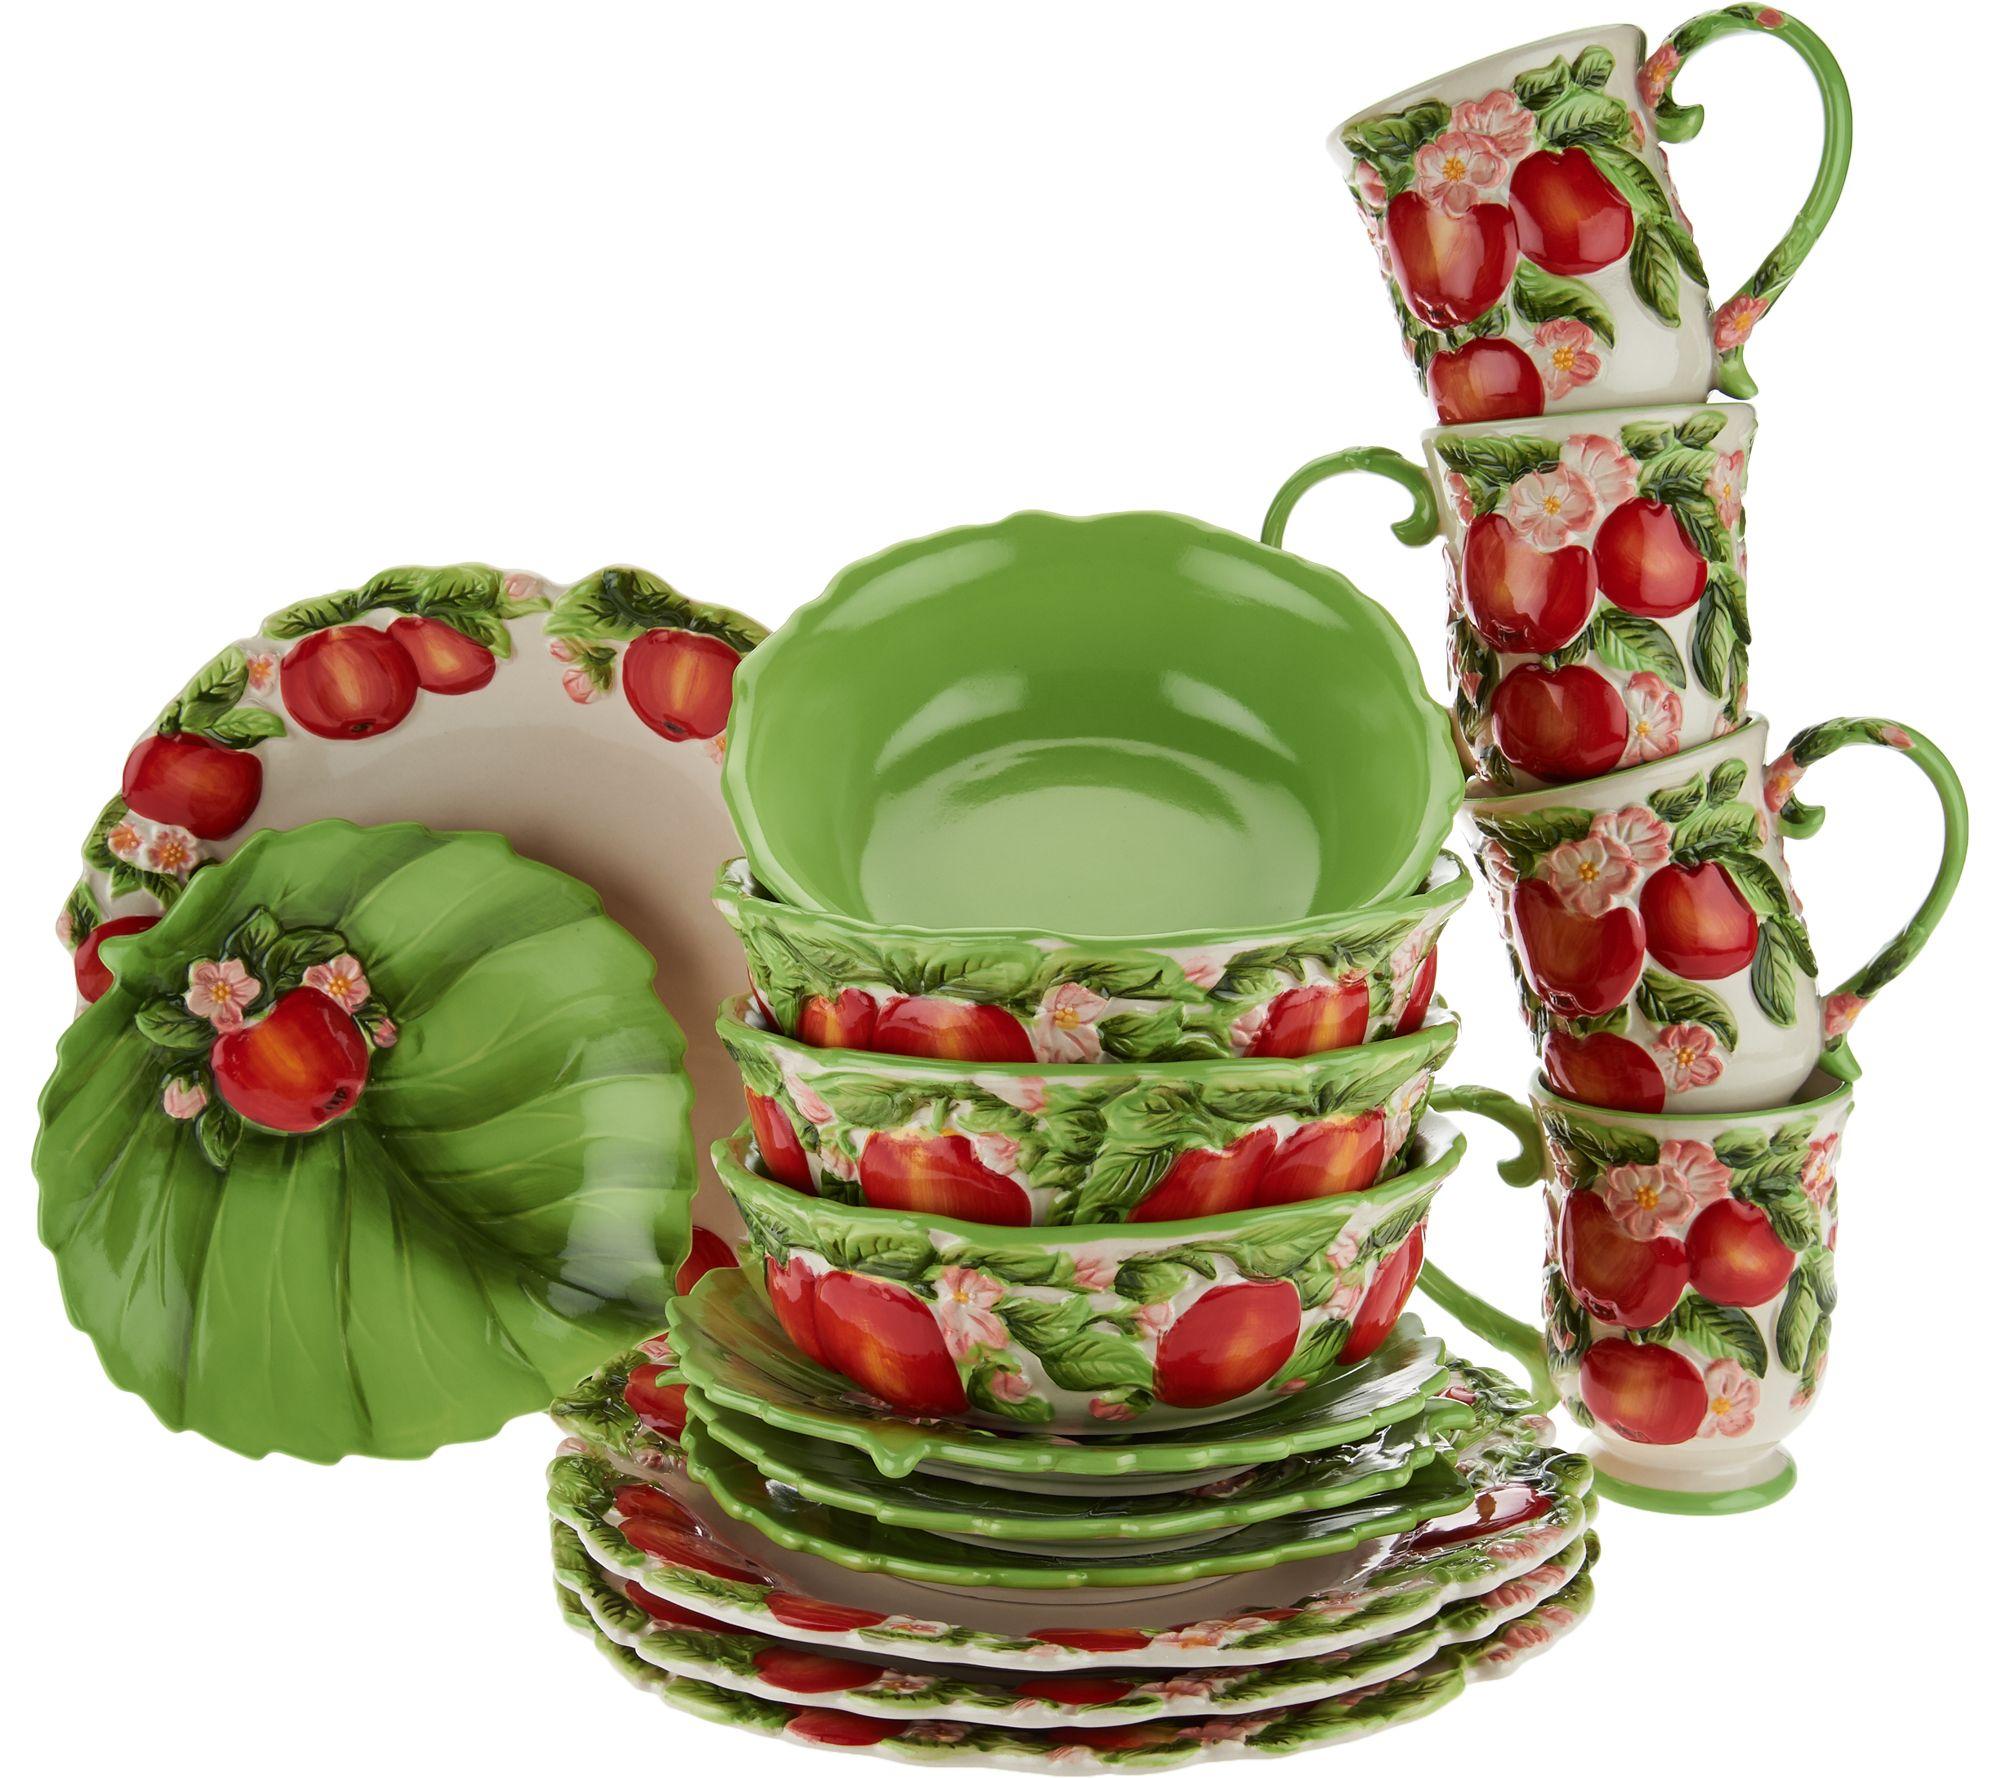 sc 1 st  QVC.com & Temp-tations Figural Fruit 16 Piece Dinnerware Set - Page 1 \u2014 QVC.com